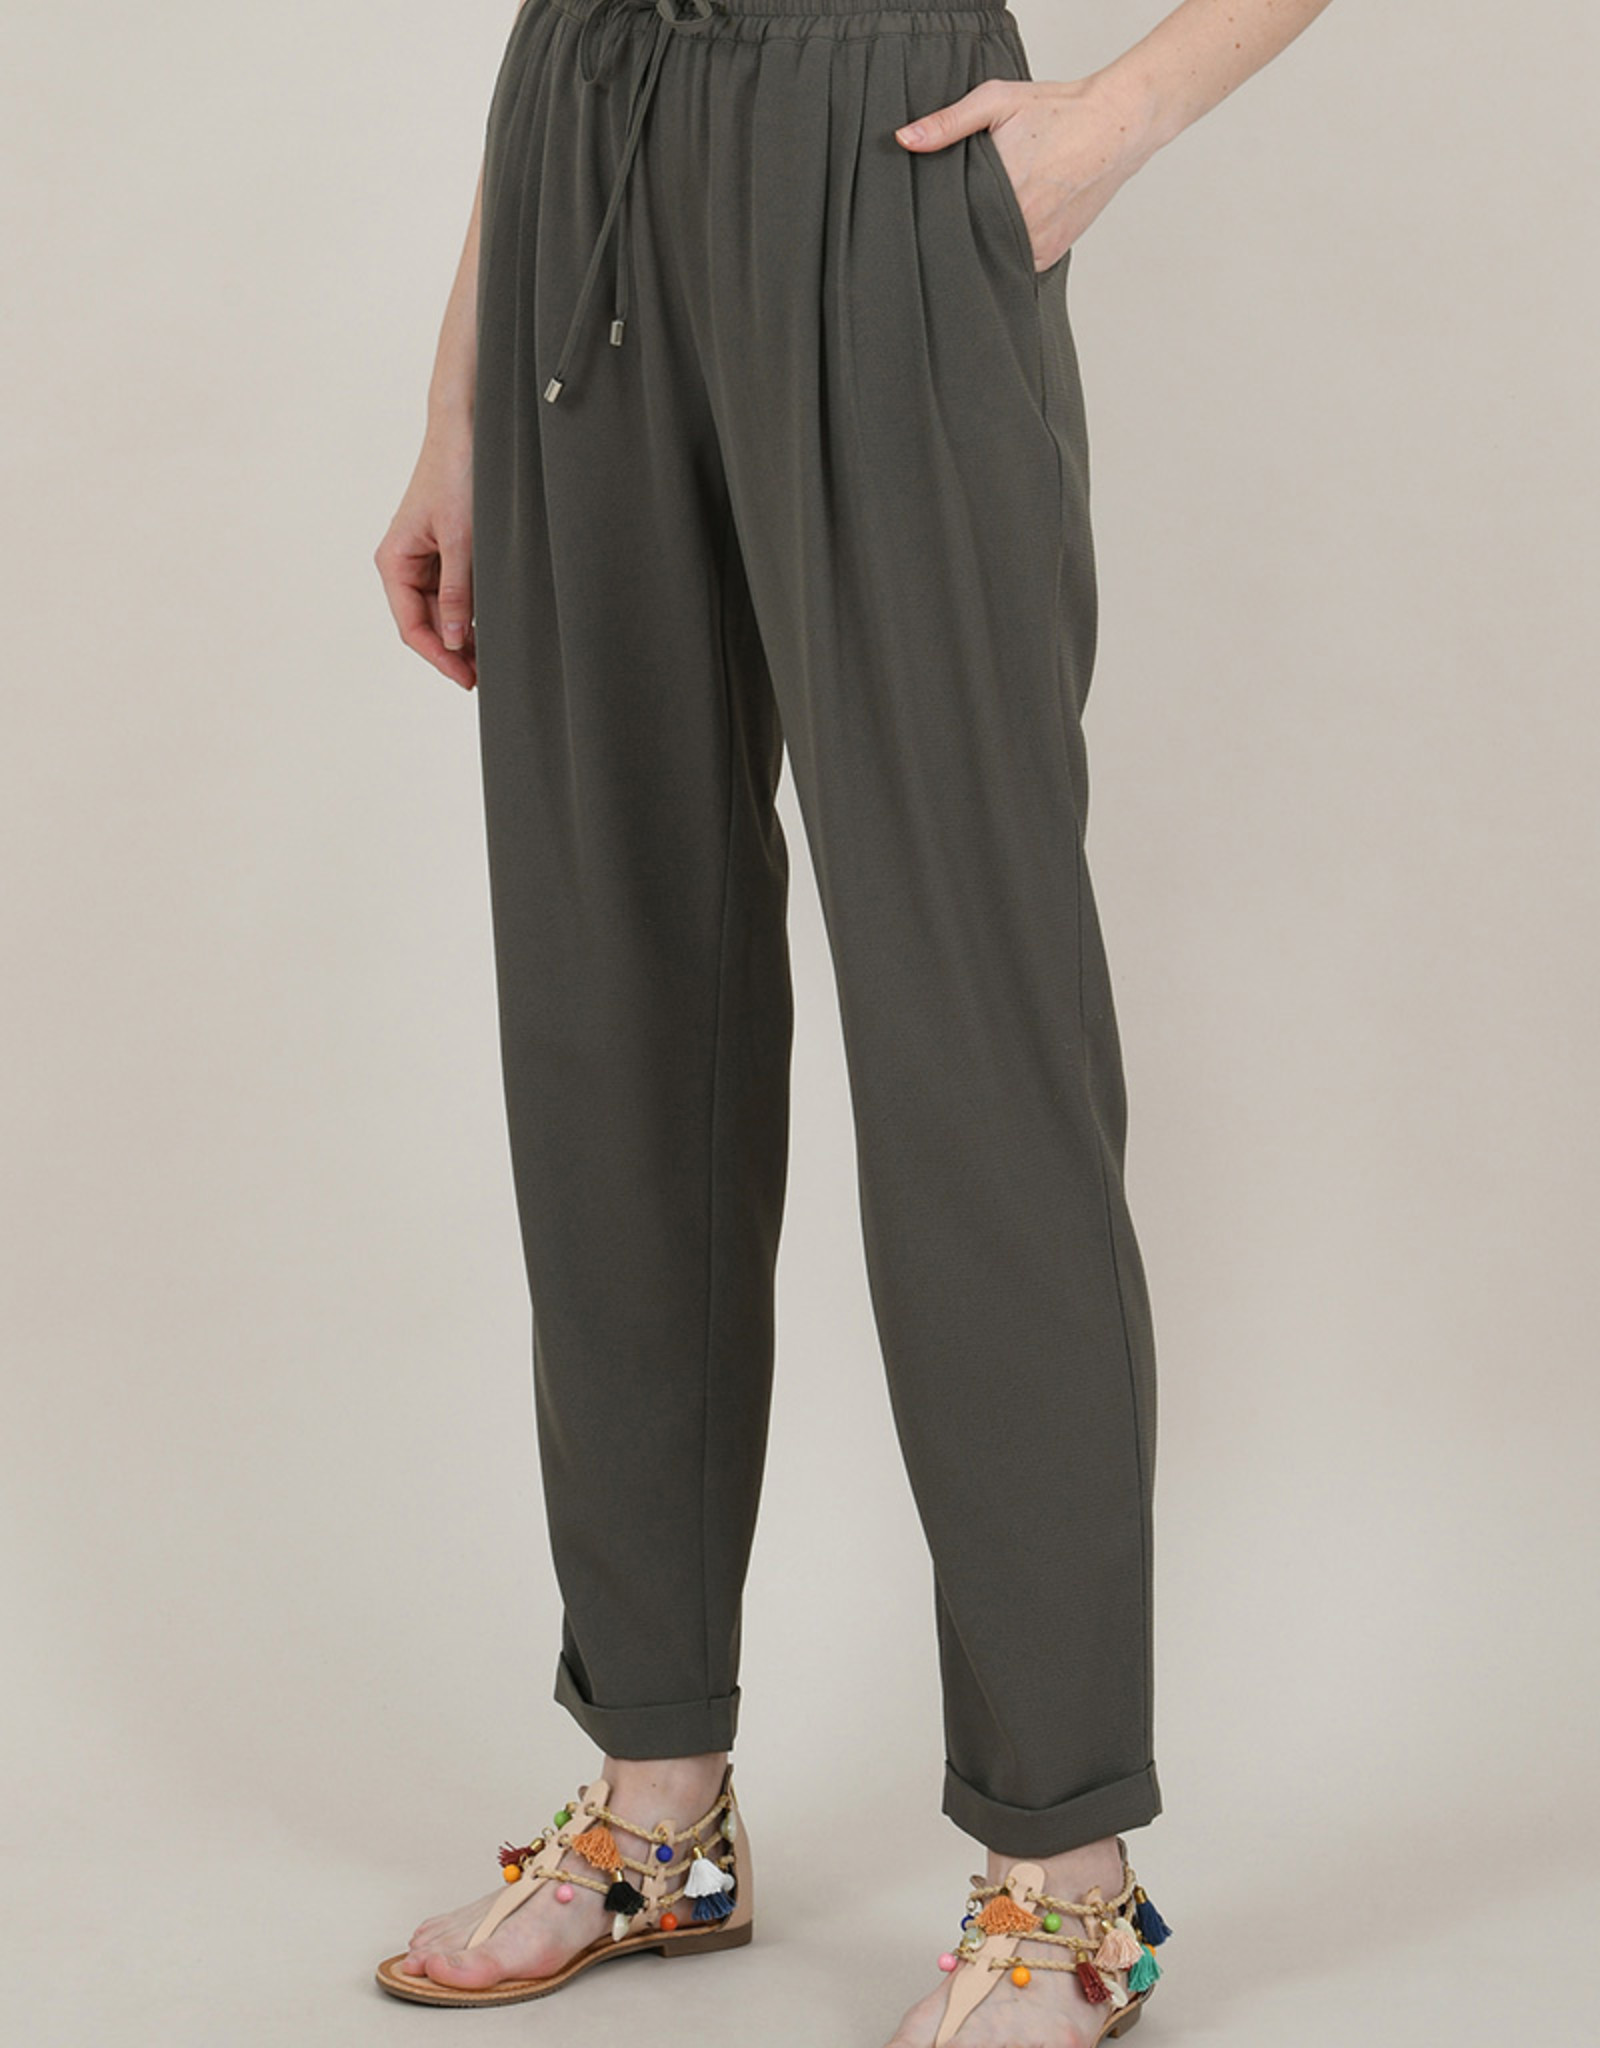 Molly Bracken High Waist Tapered Pull-on Pant